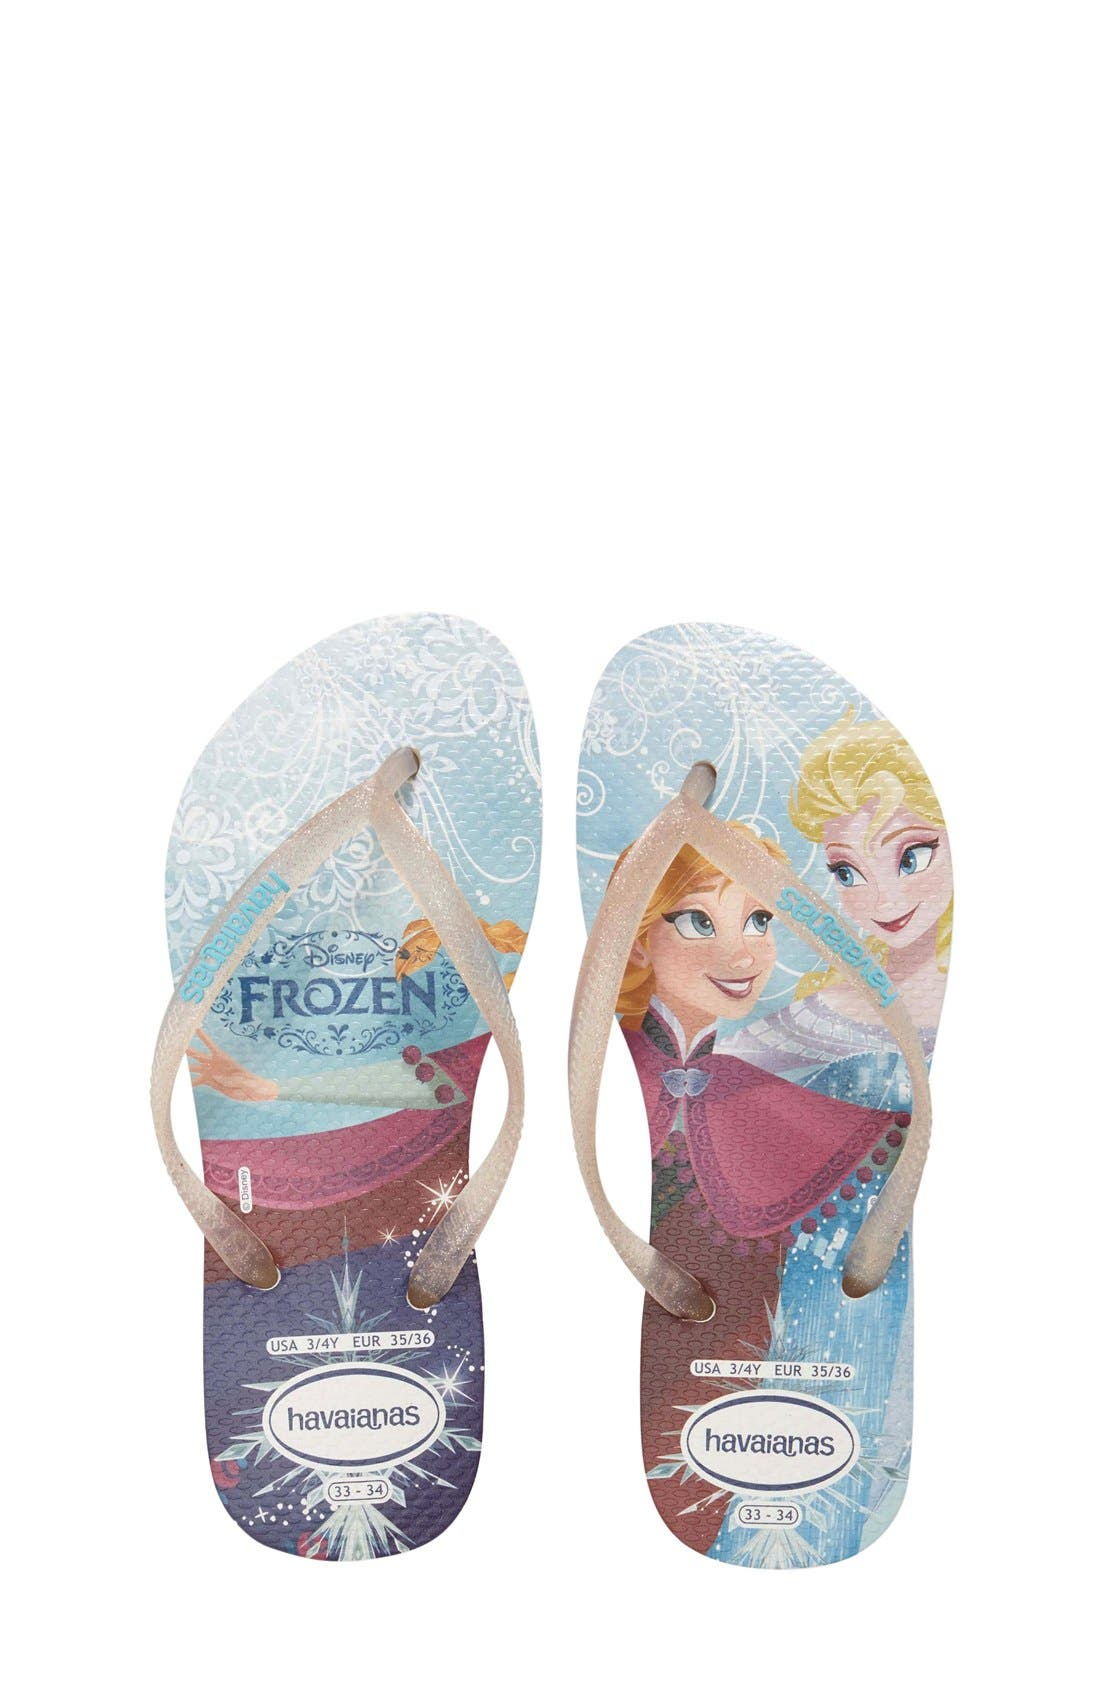 Alternate Image 1 Selected - Havaianas 'Disney Princess' Flip Flops (Toddler & Little Kid)